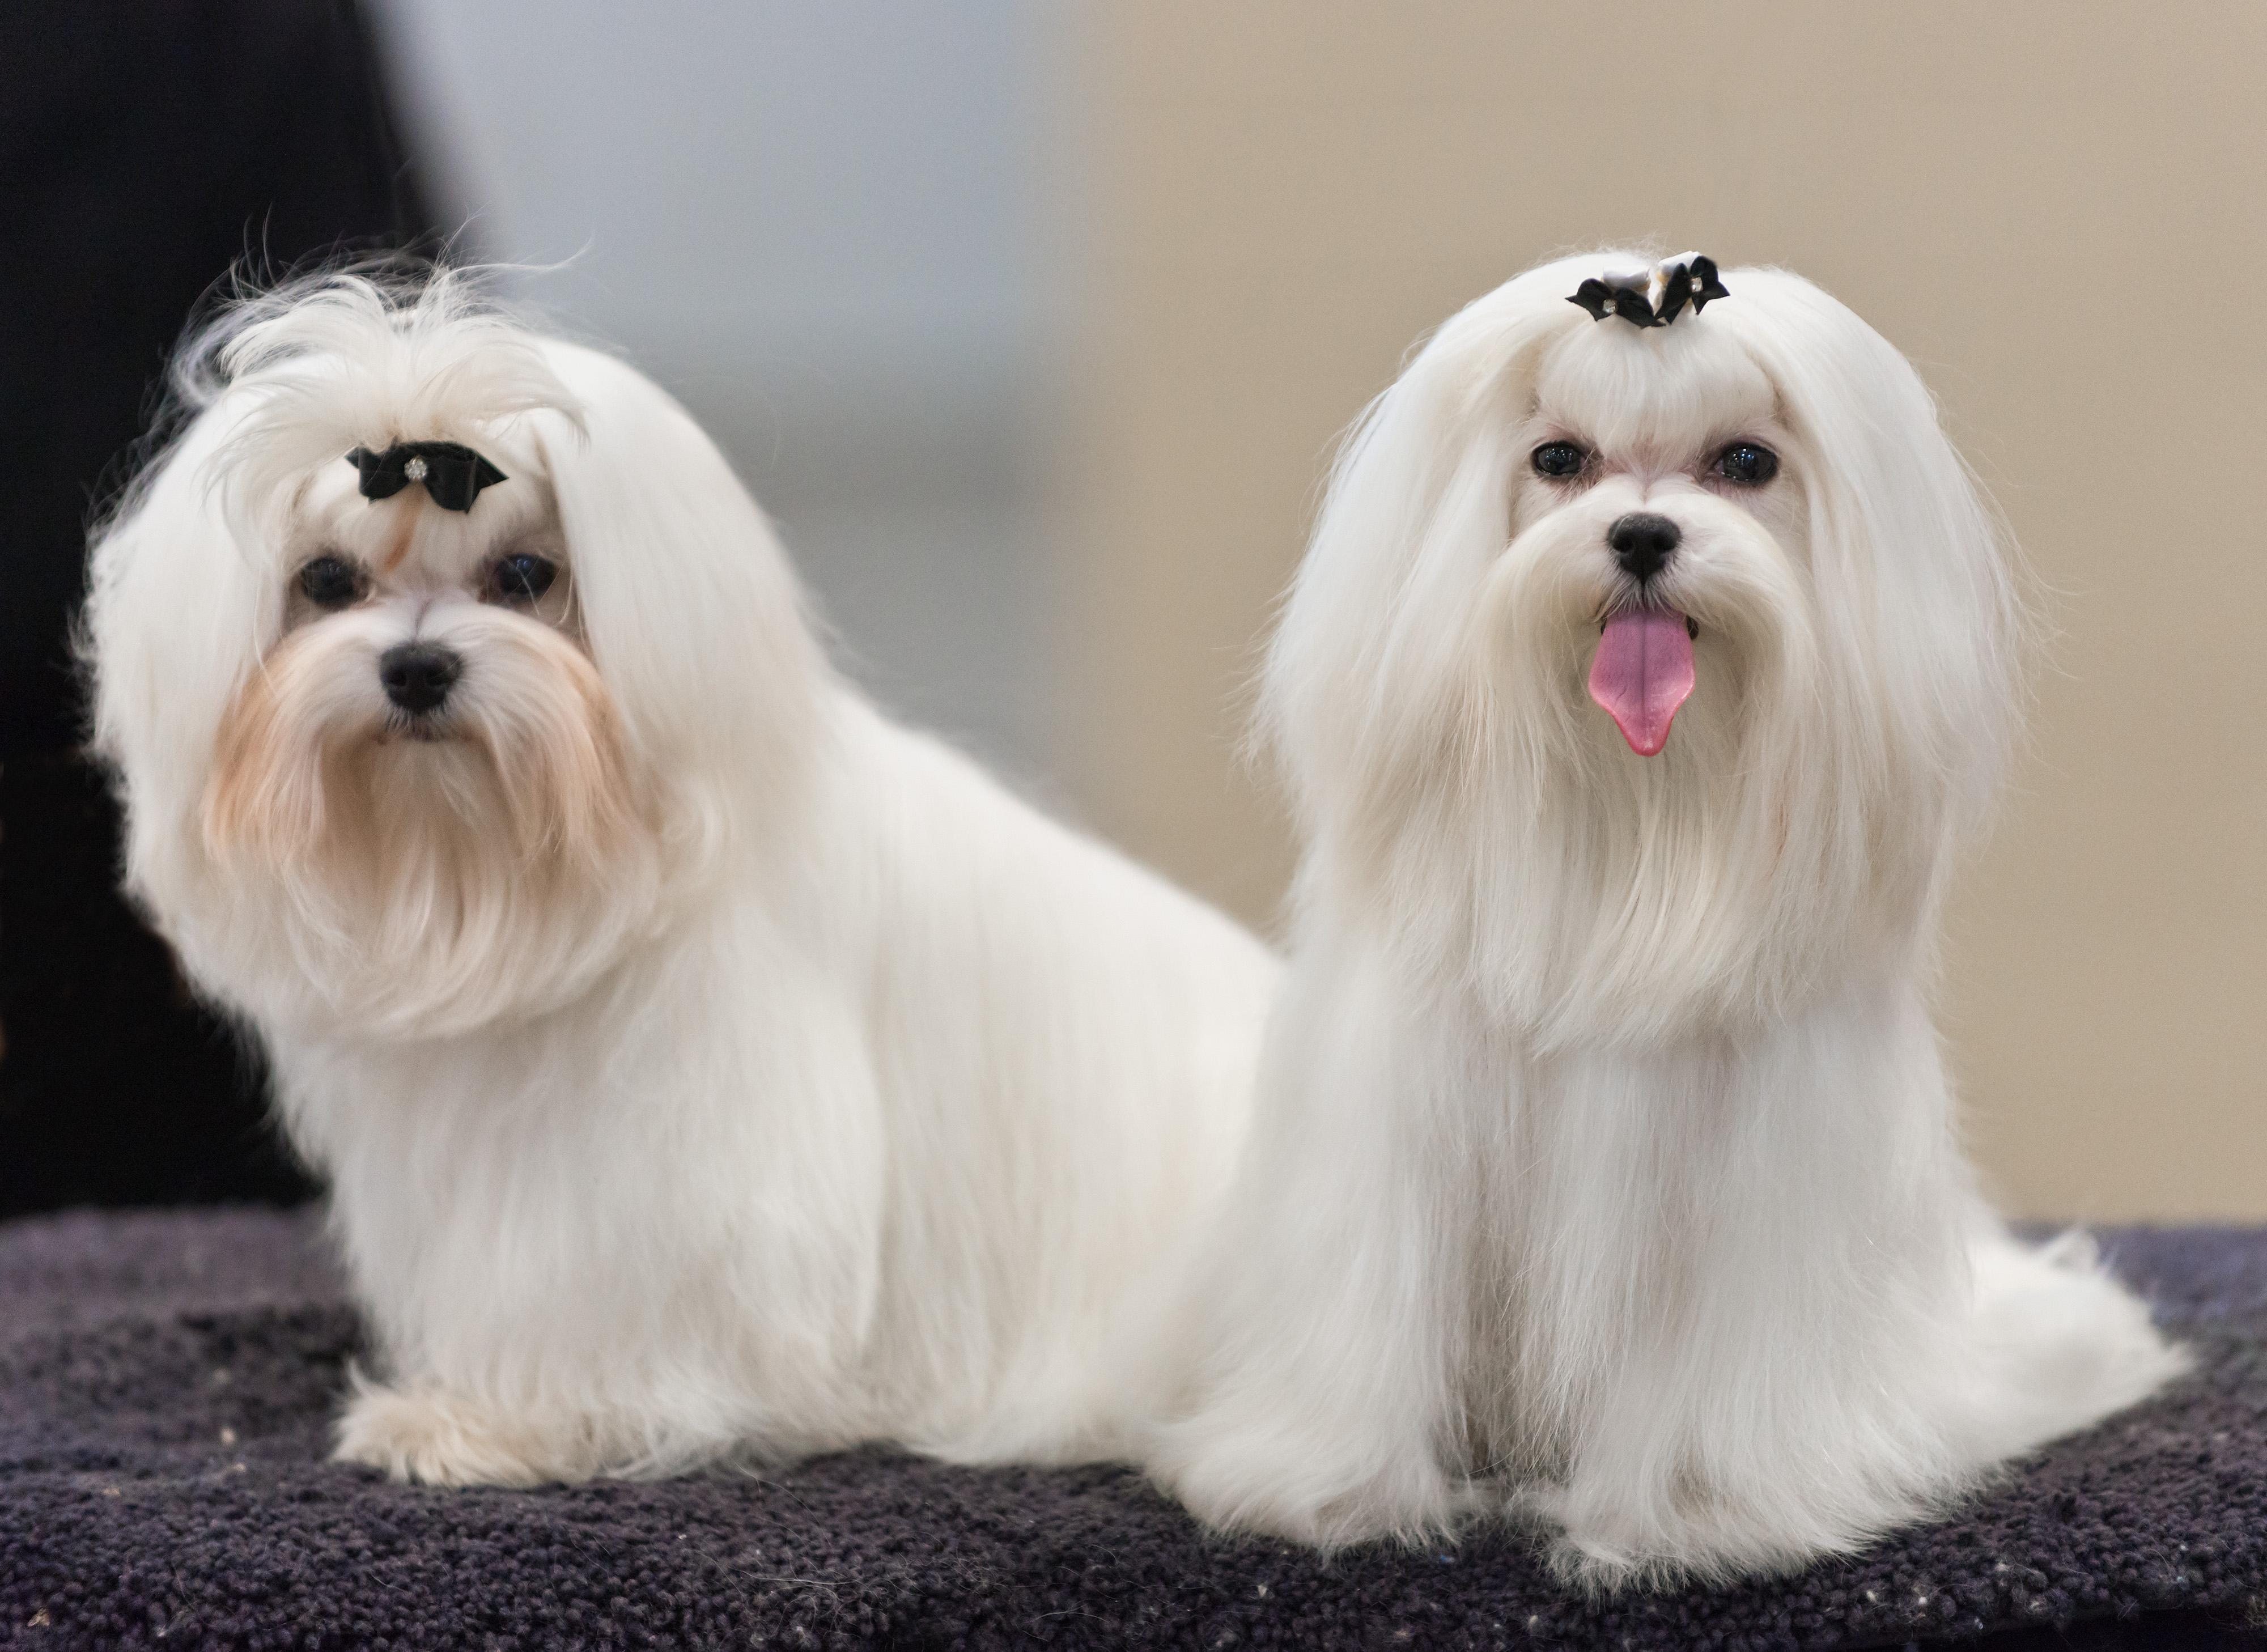 Malteses Maltese (dog) - wikipedia